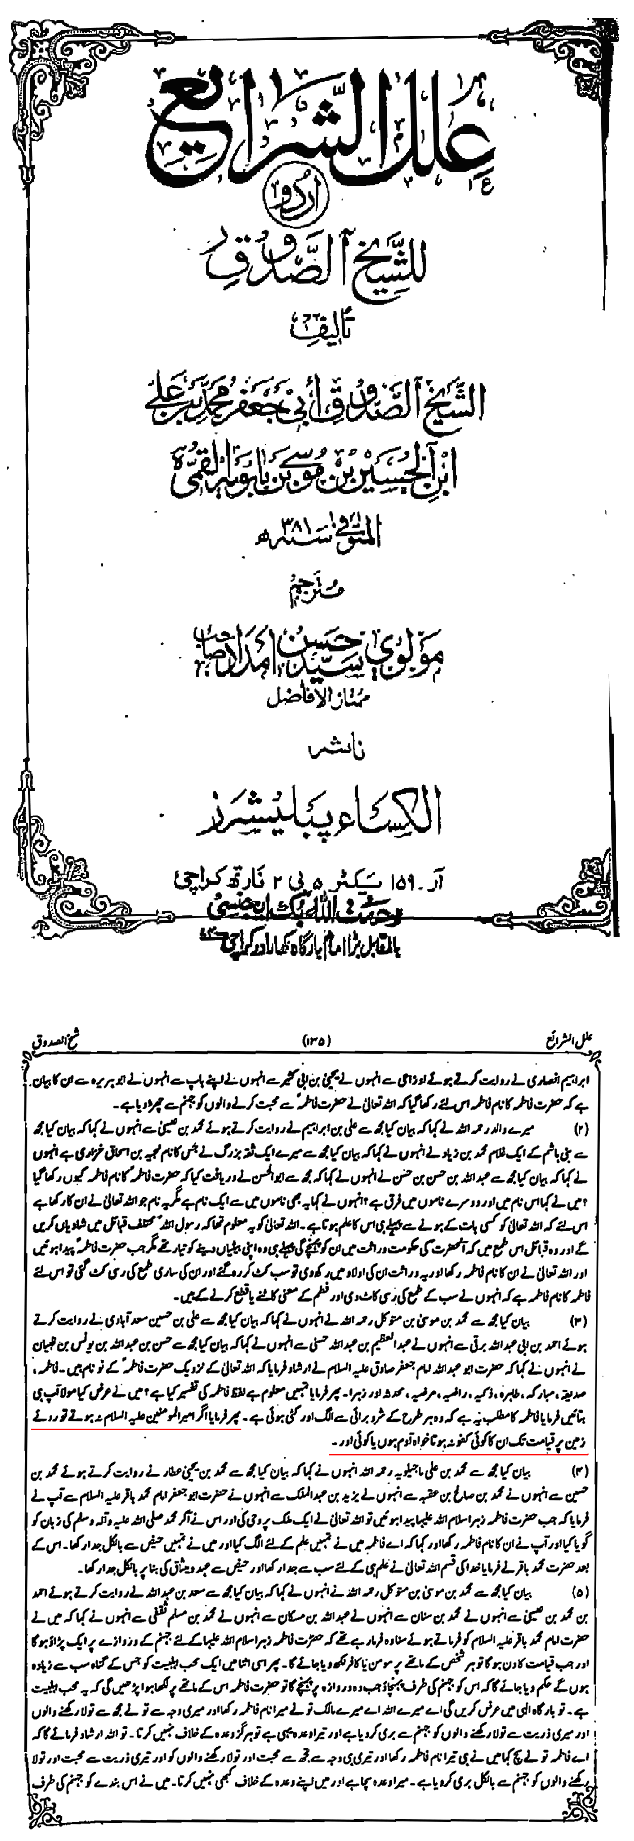 adam-ilal-saduq-1.png